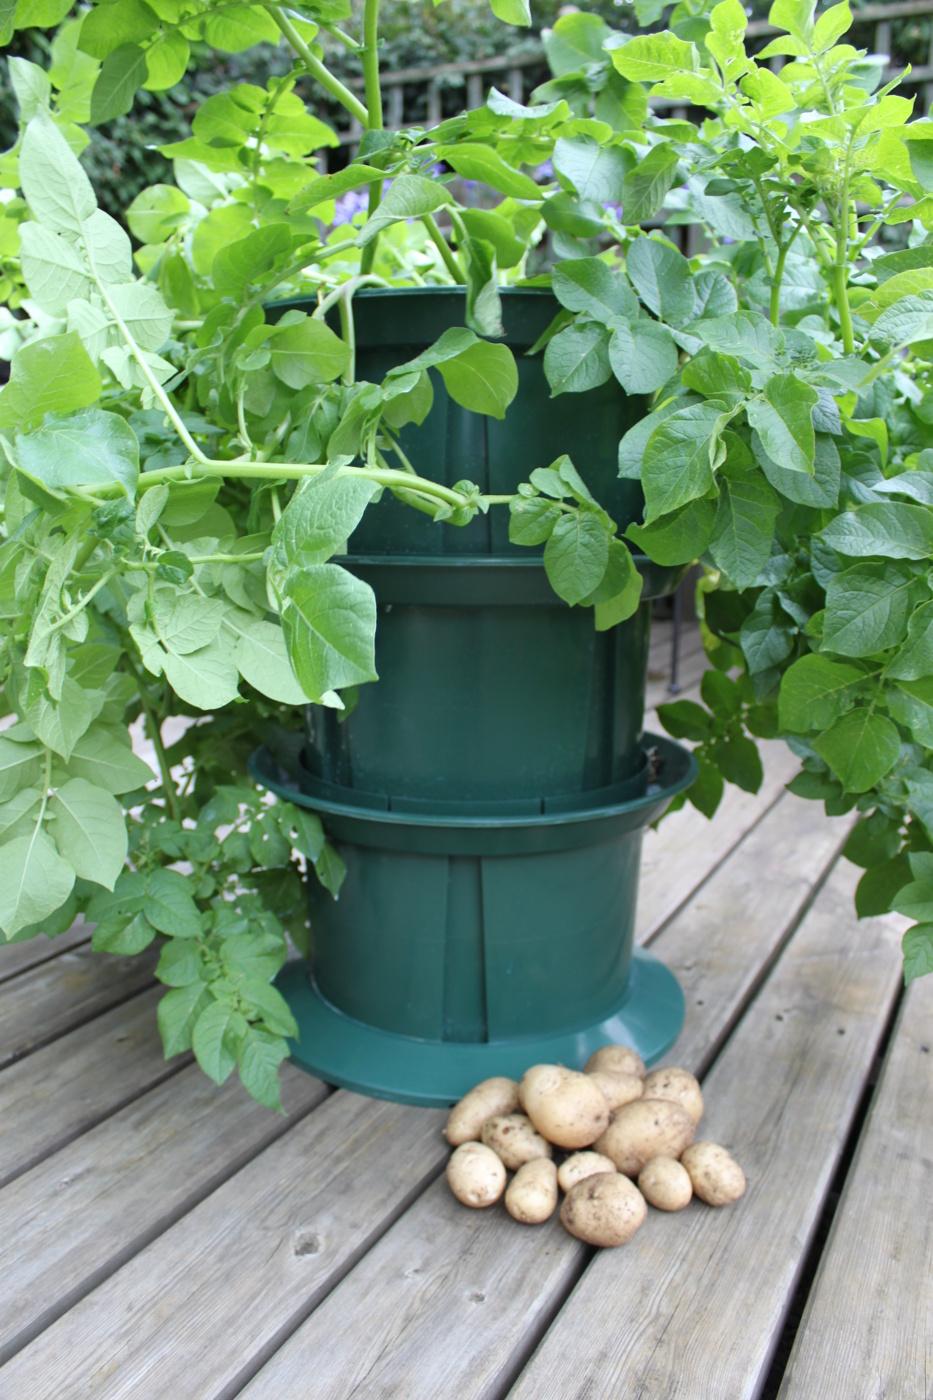 odla potatis på höjden odlingssystem